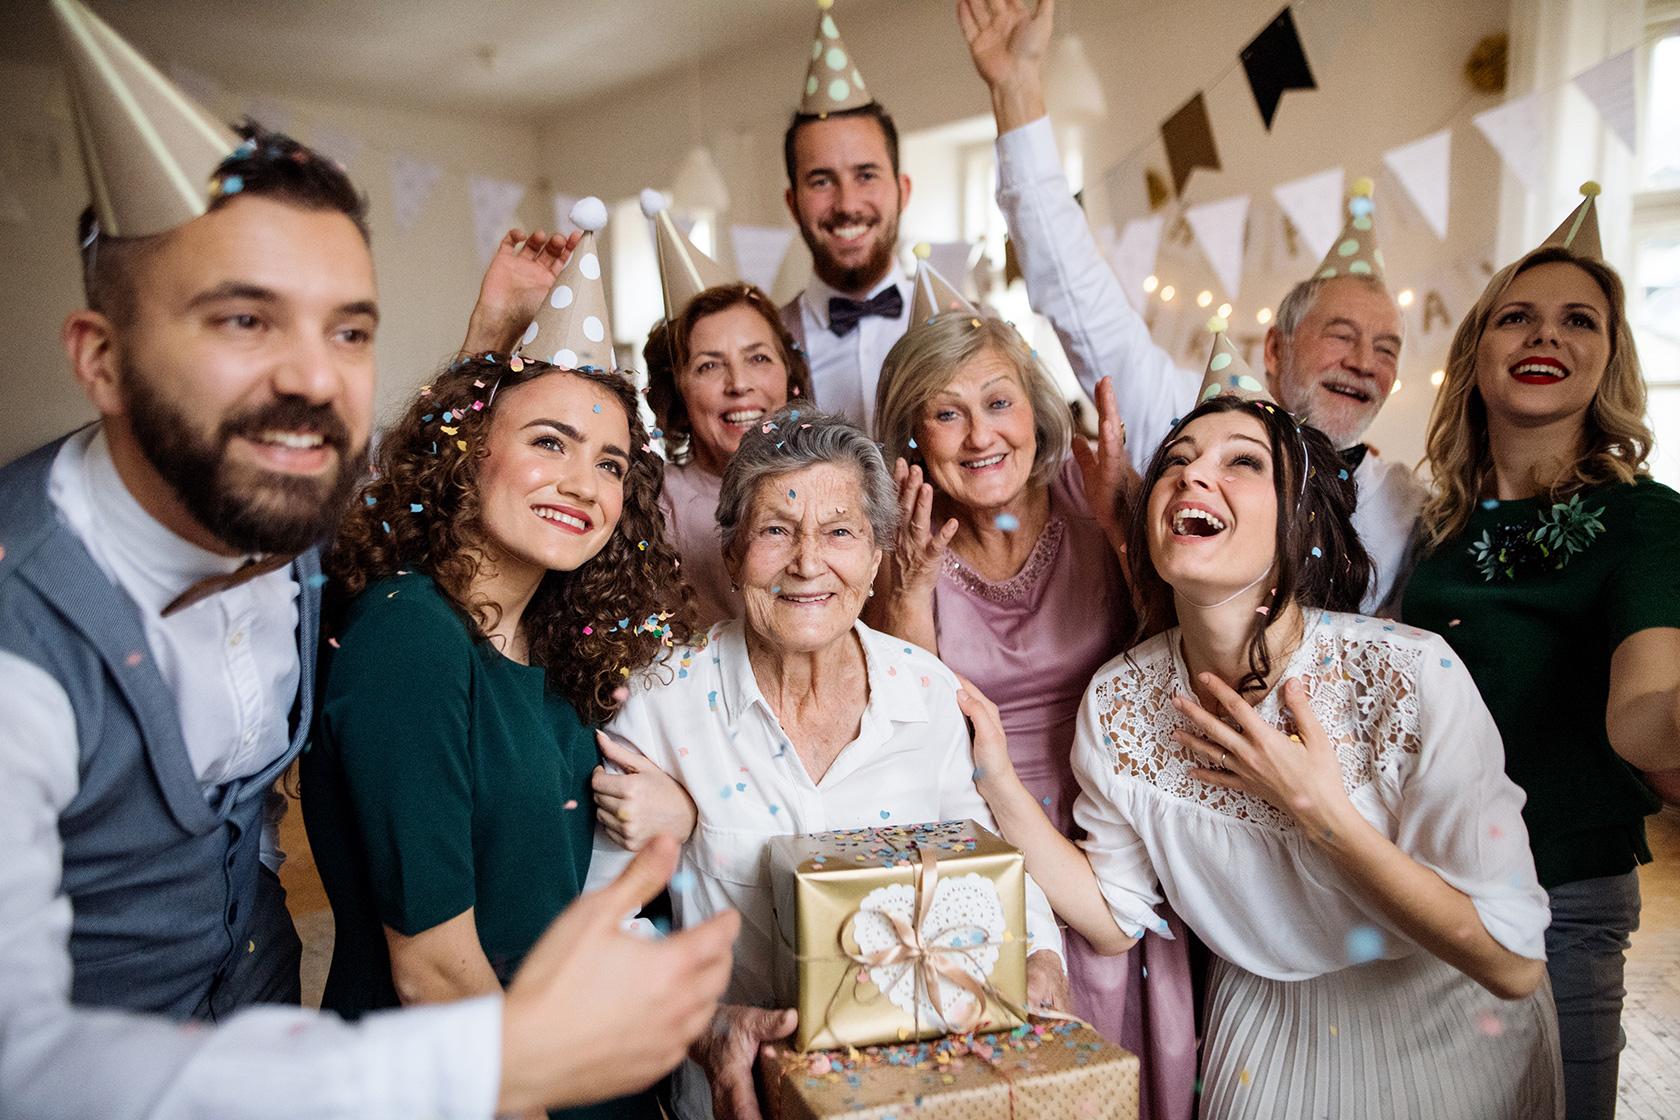 [photo] A family surrounding their grandma celebrating her birthday